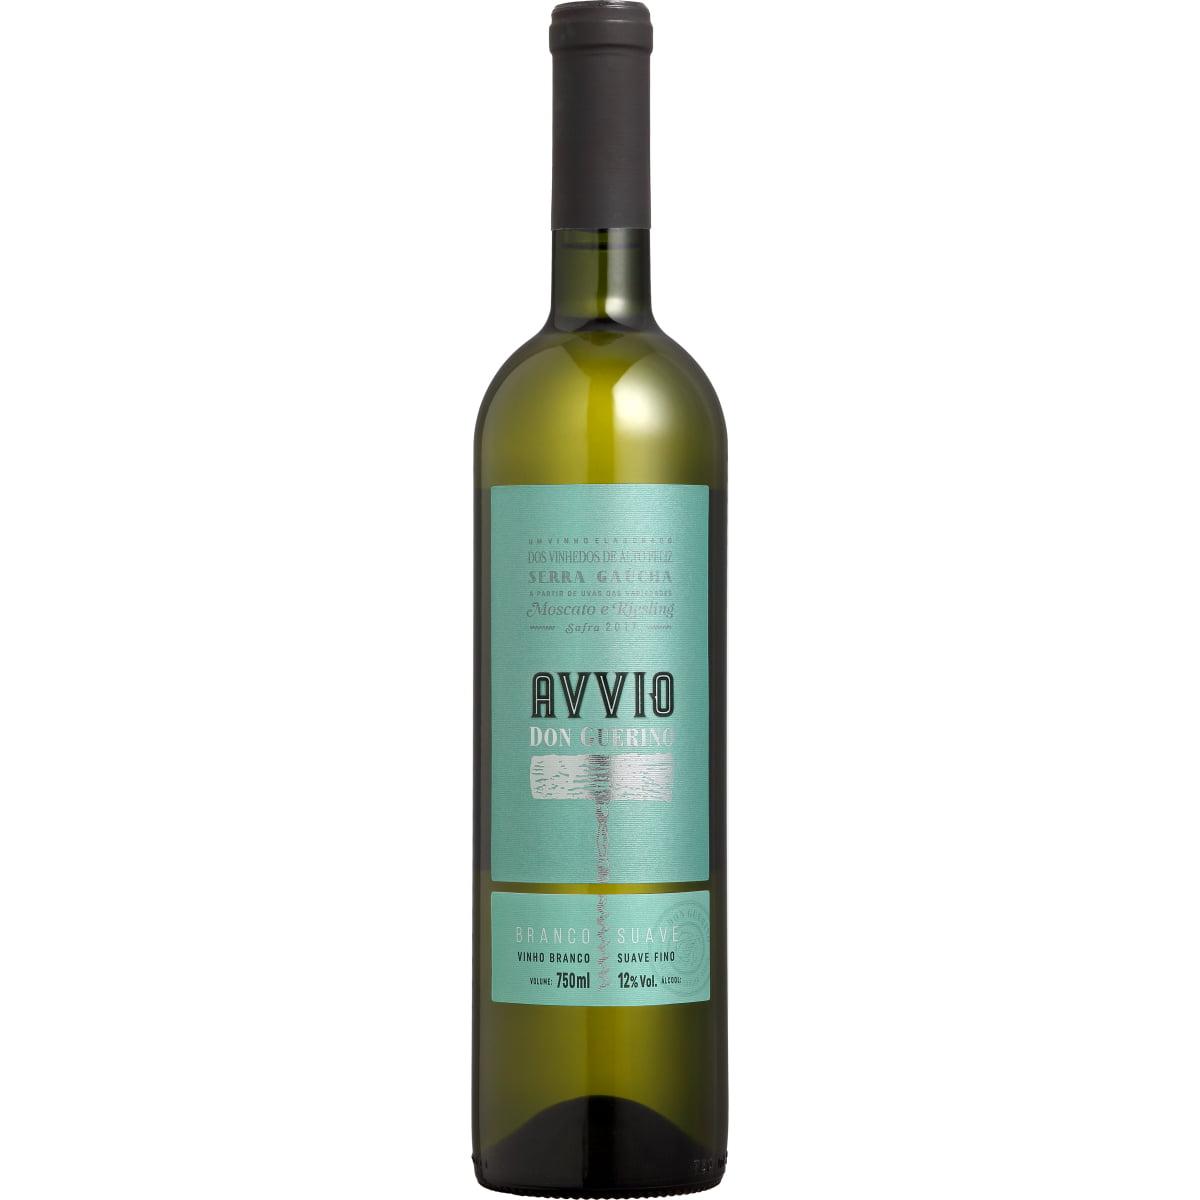 Vinho Don Guerino Avvio Moscato/Riesling Branco Suave 750ml